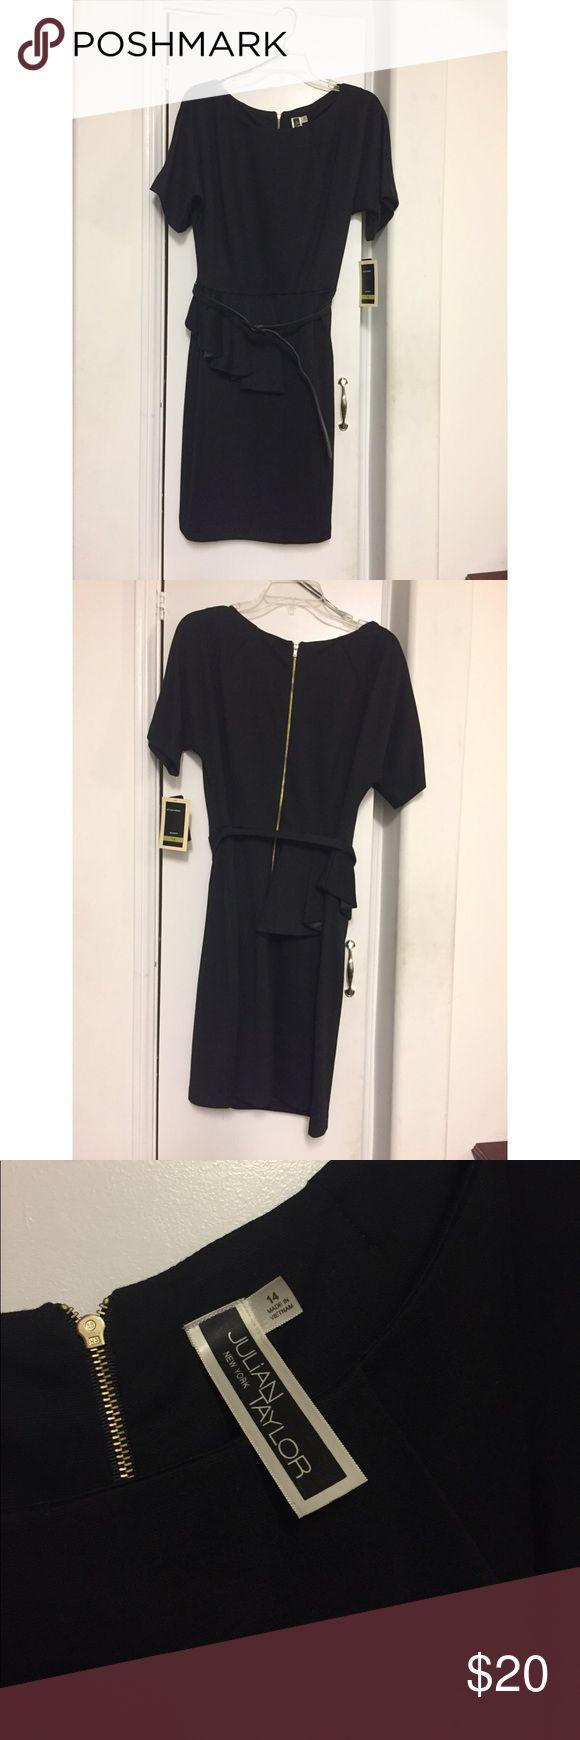 Julian Taylor New York Black Peplum Dress Never been worn. True to size. Adjustable belt. Mid length LBD. Julian Taylor Dresses Midi